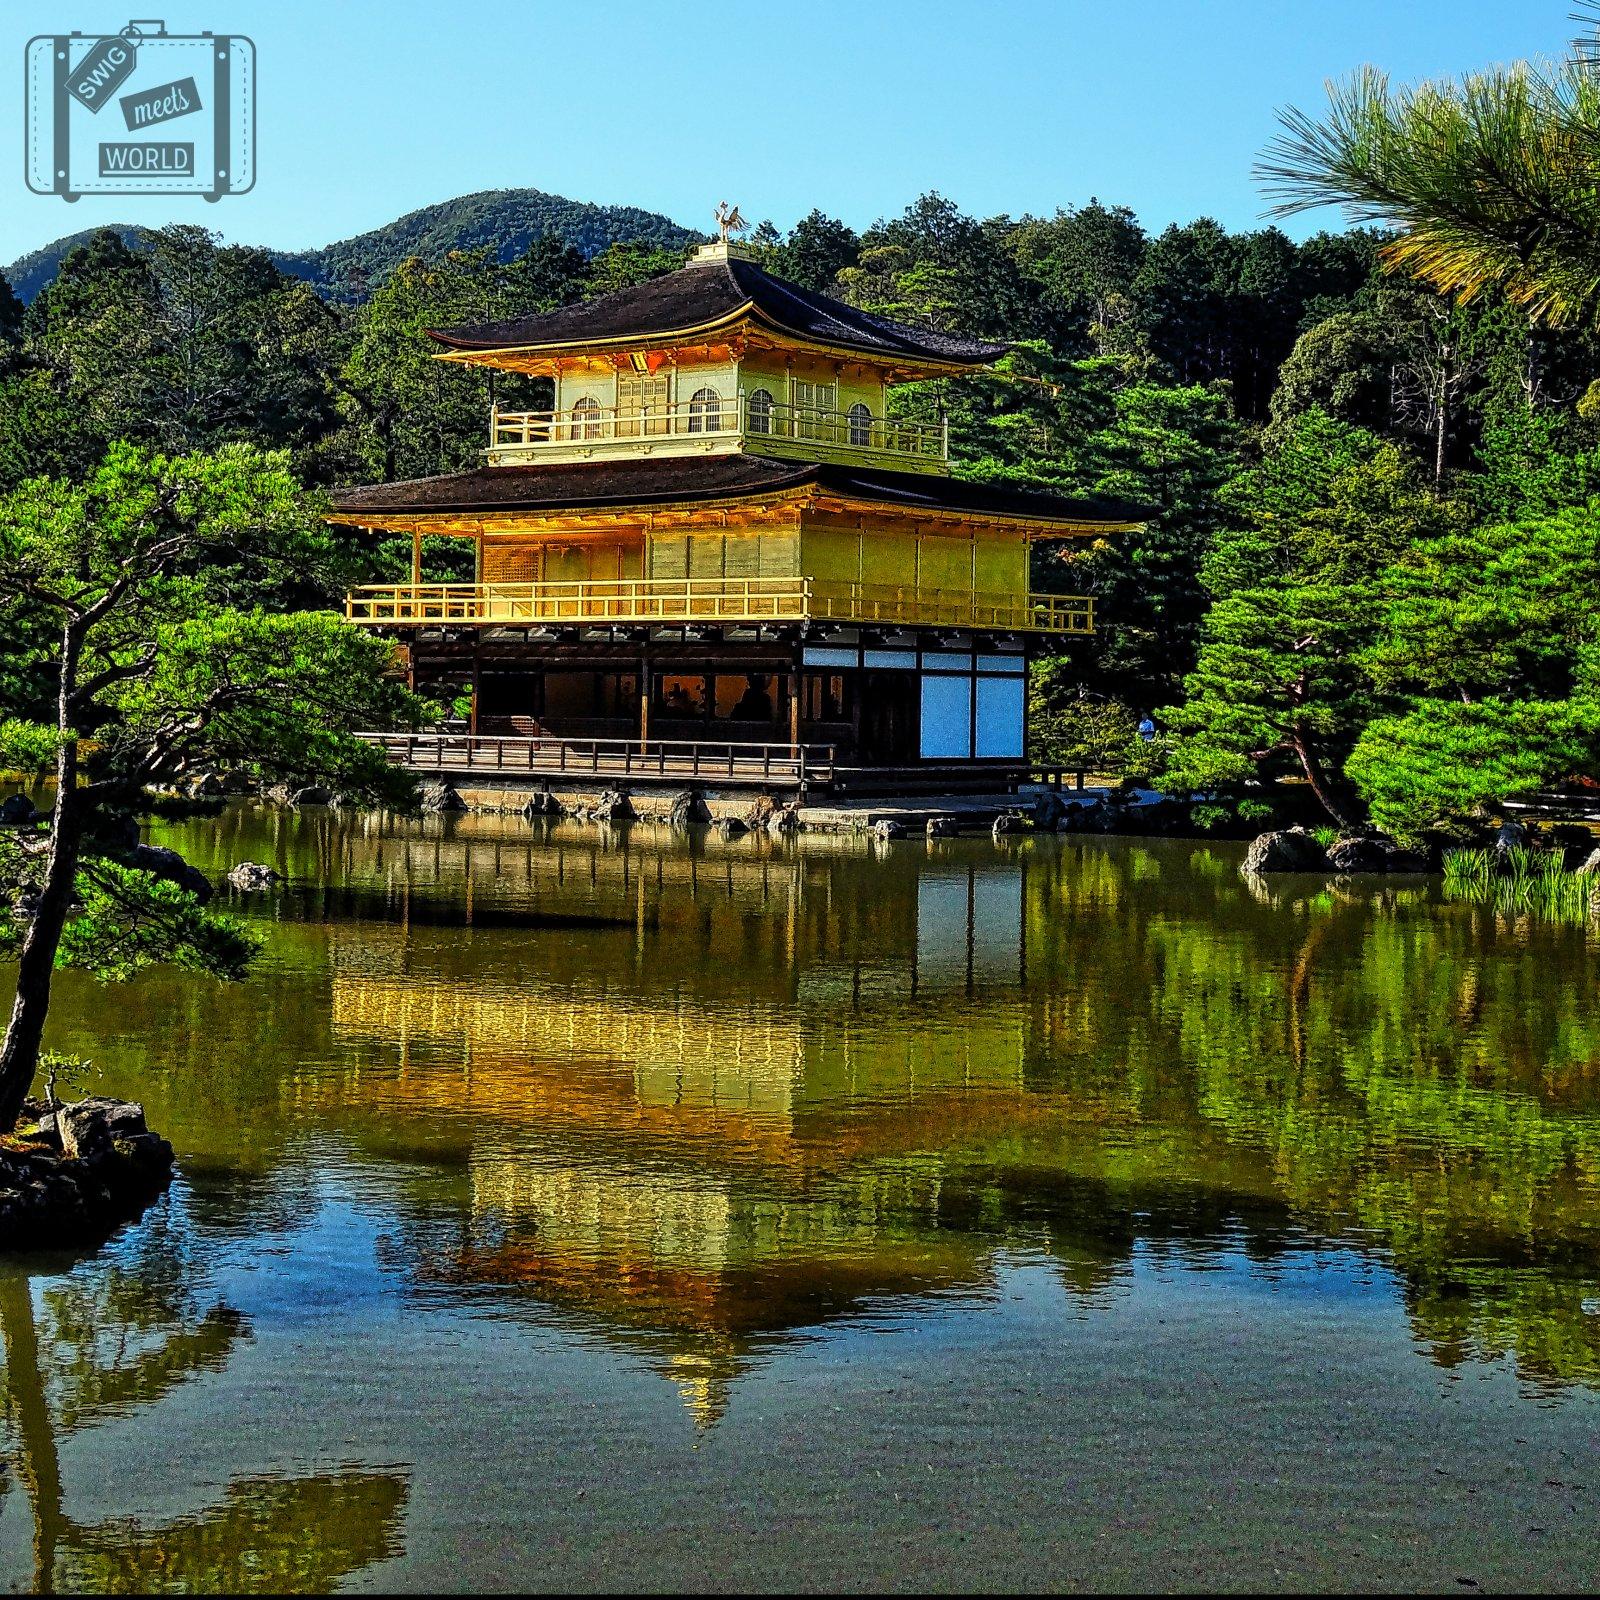 10Mb golden pavillion watermark insty 10mb - swig meets world